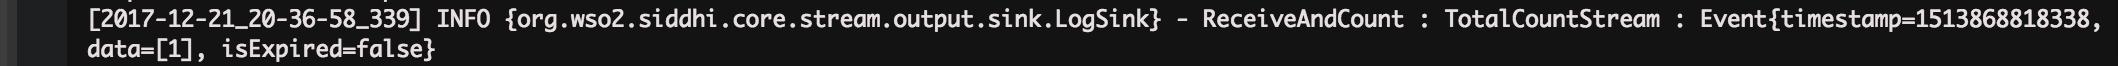 Output Log